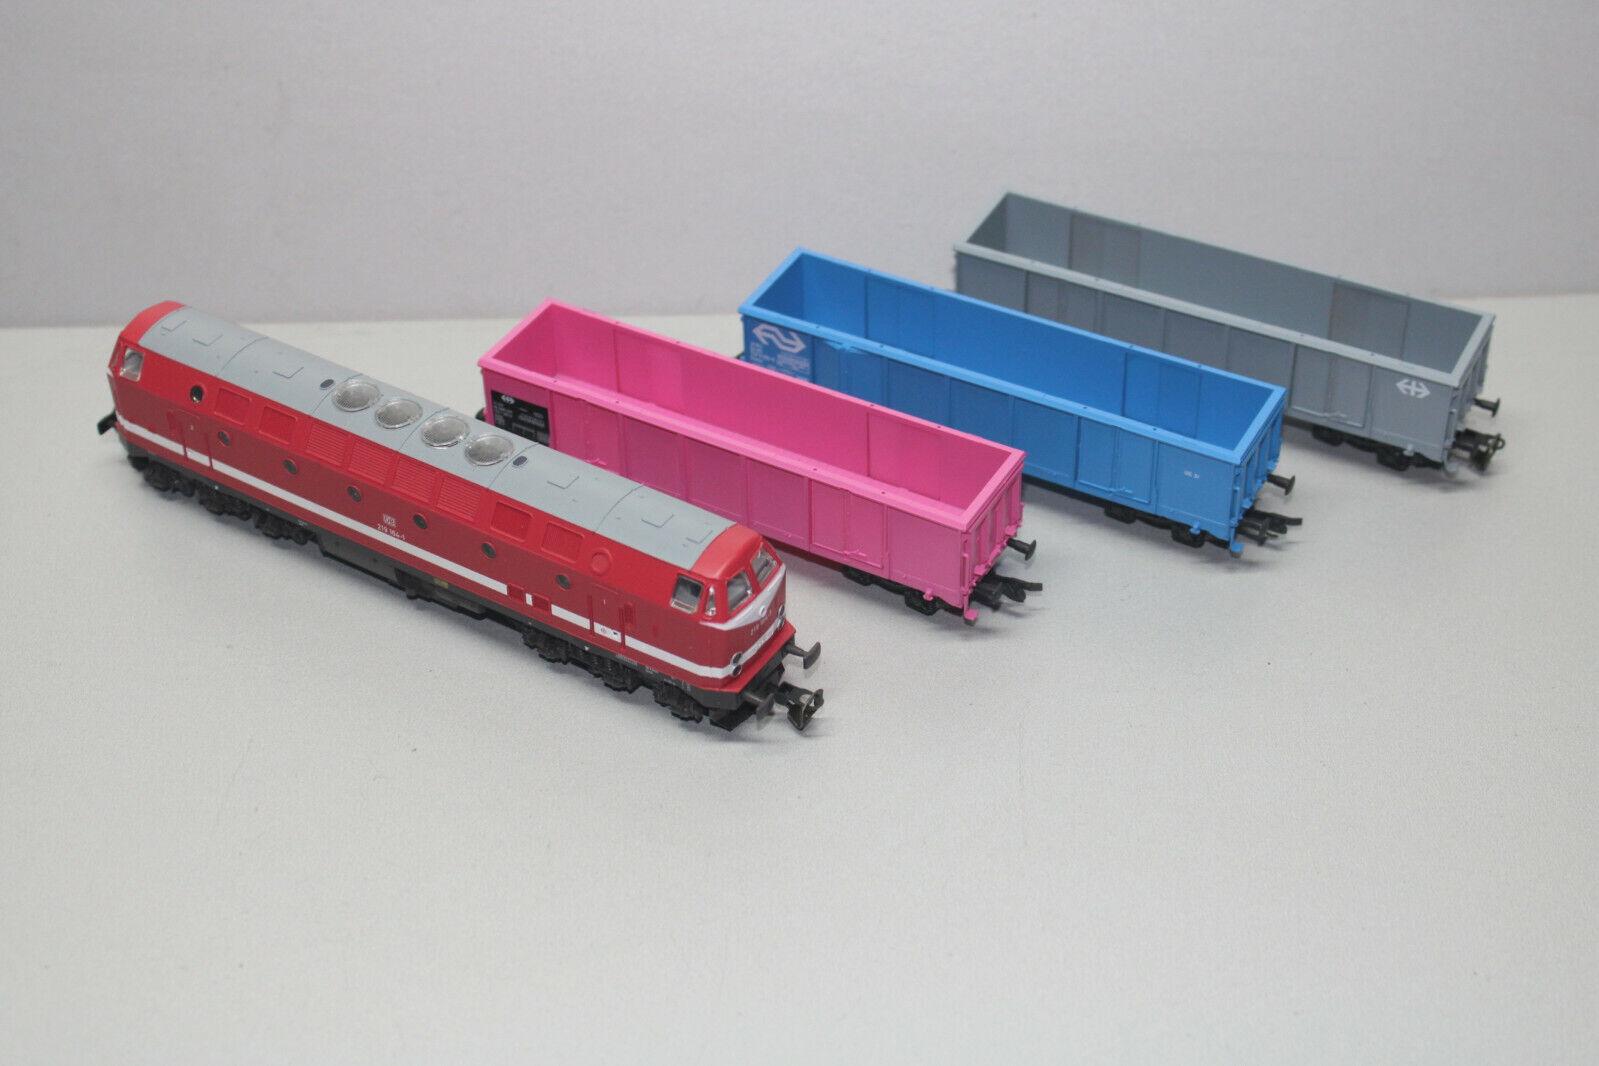 Tren digital tilling, con 219 DB y 3 en en en edges orbital TT. 3e2